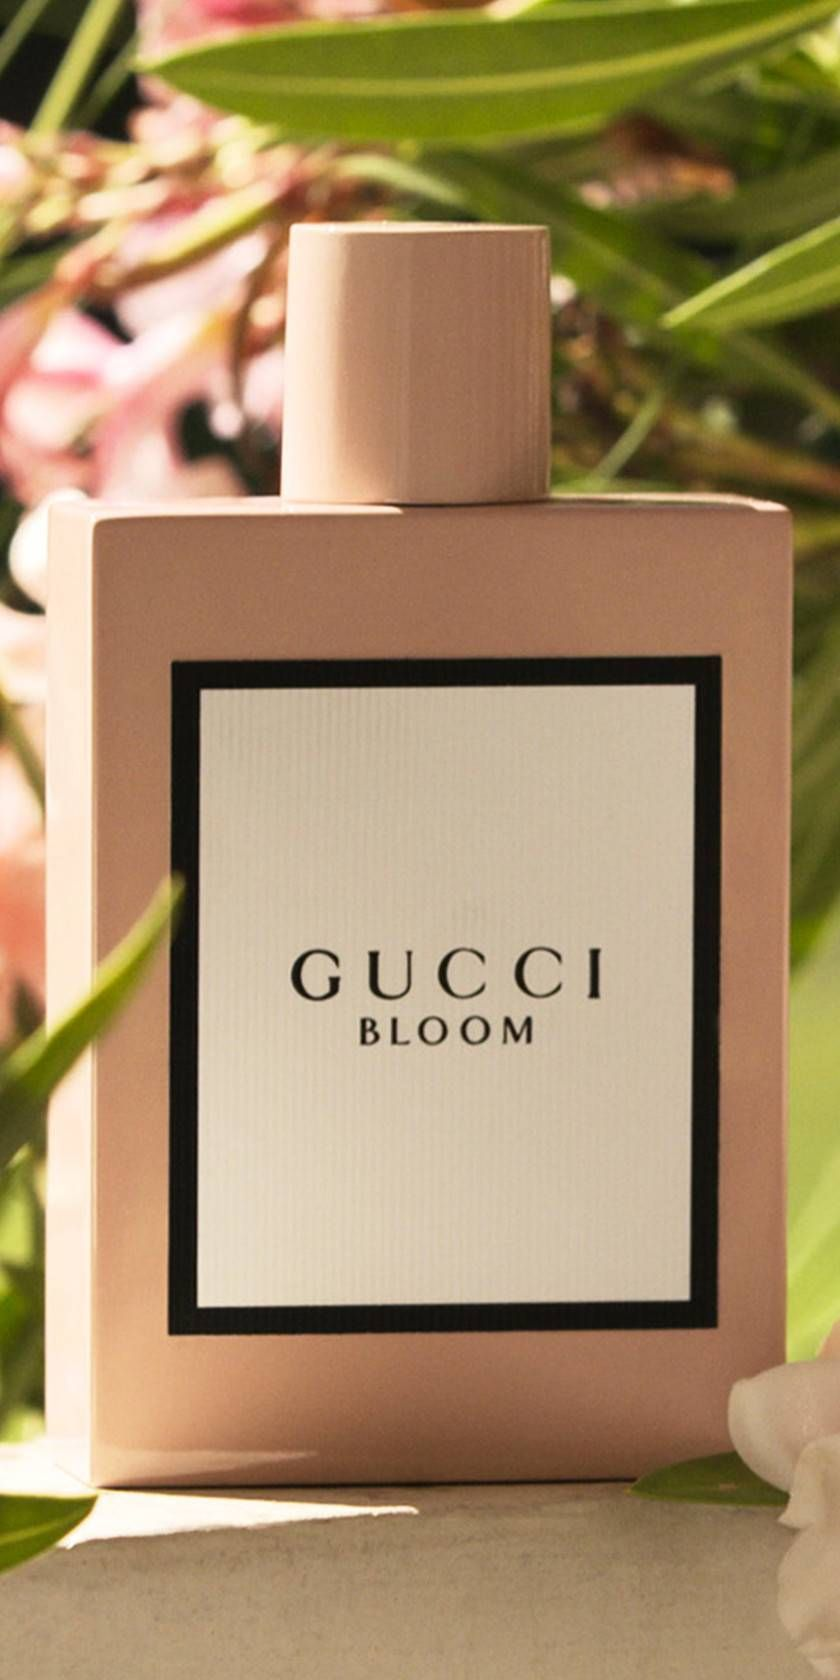 Gucci Bloom 100ml Eau De Parfum In 2019 Skin Care Versace